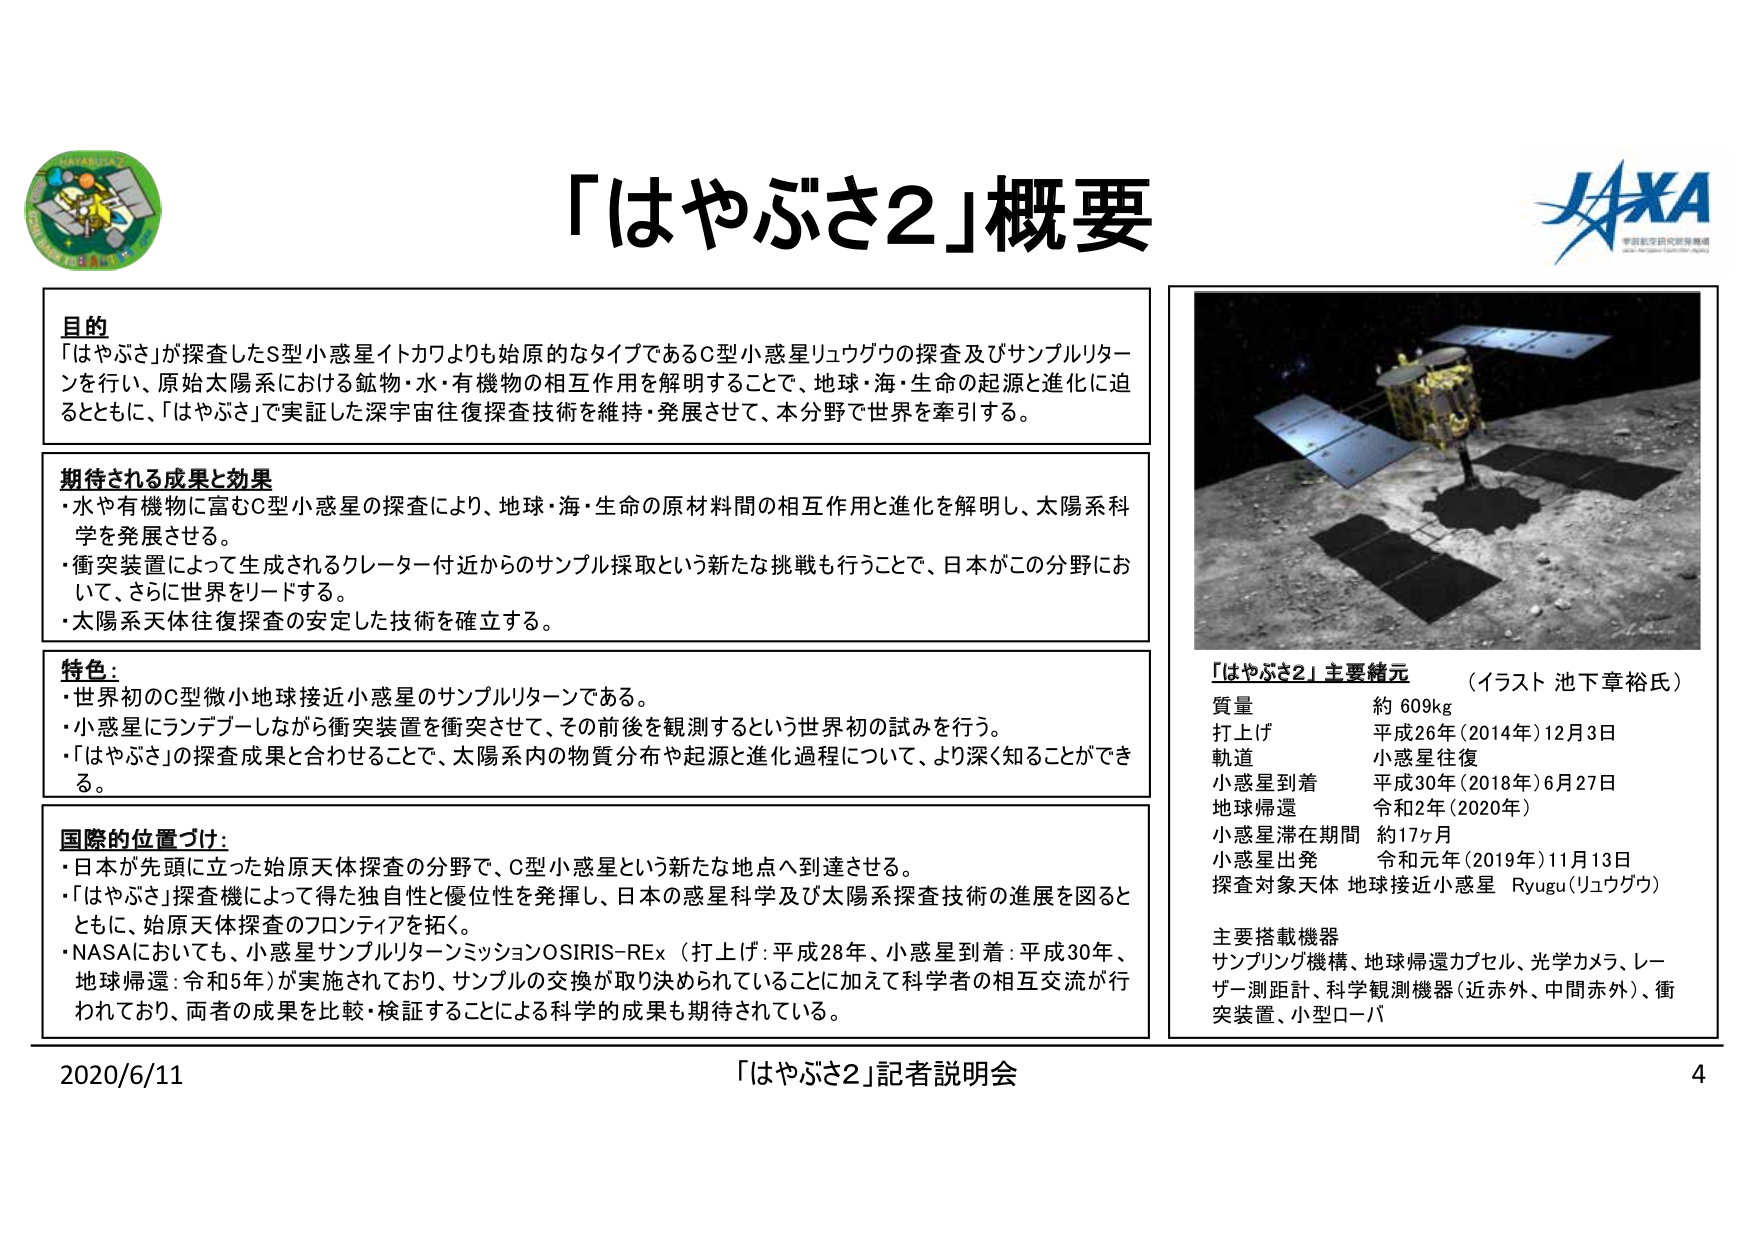 f:id:Imamura:20200611094457p:plain